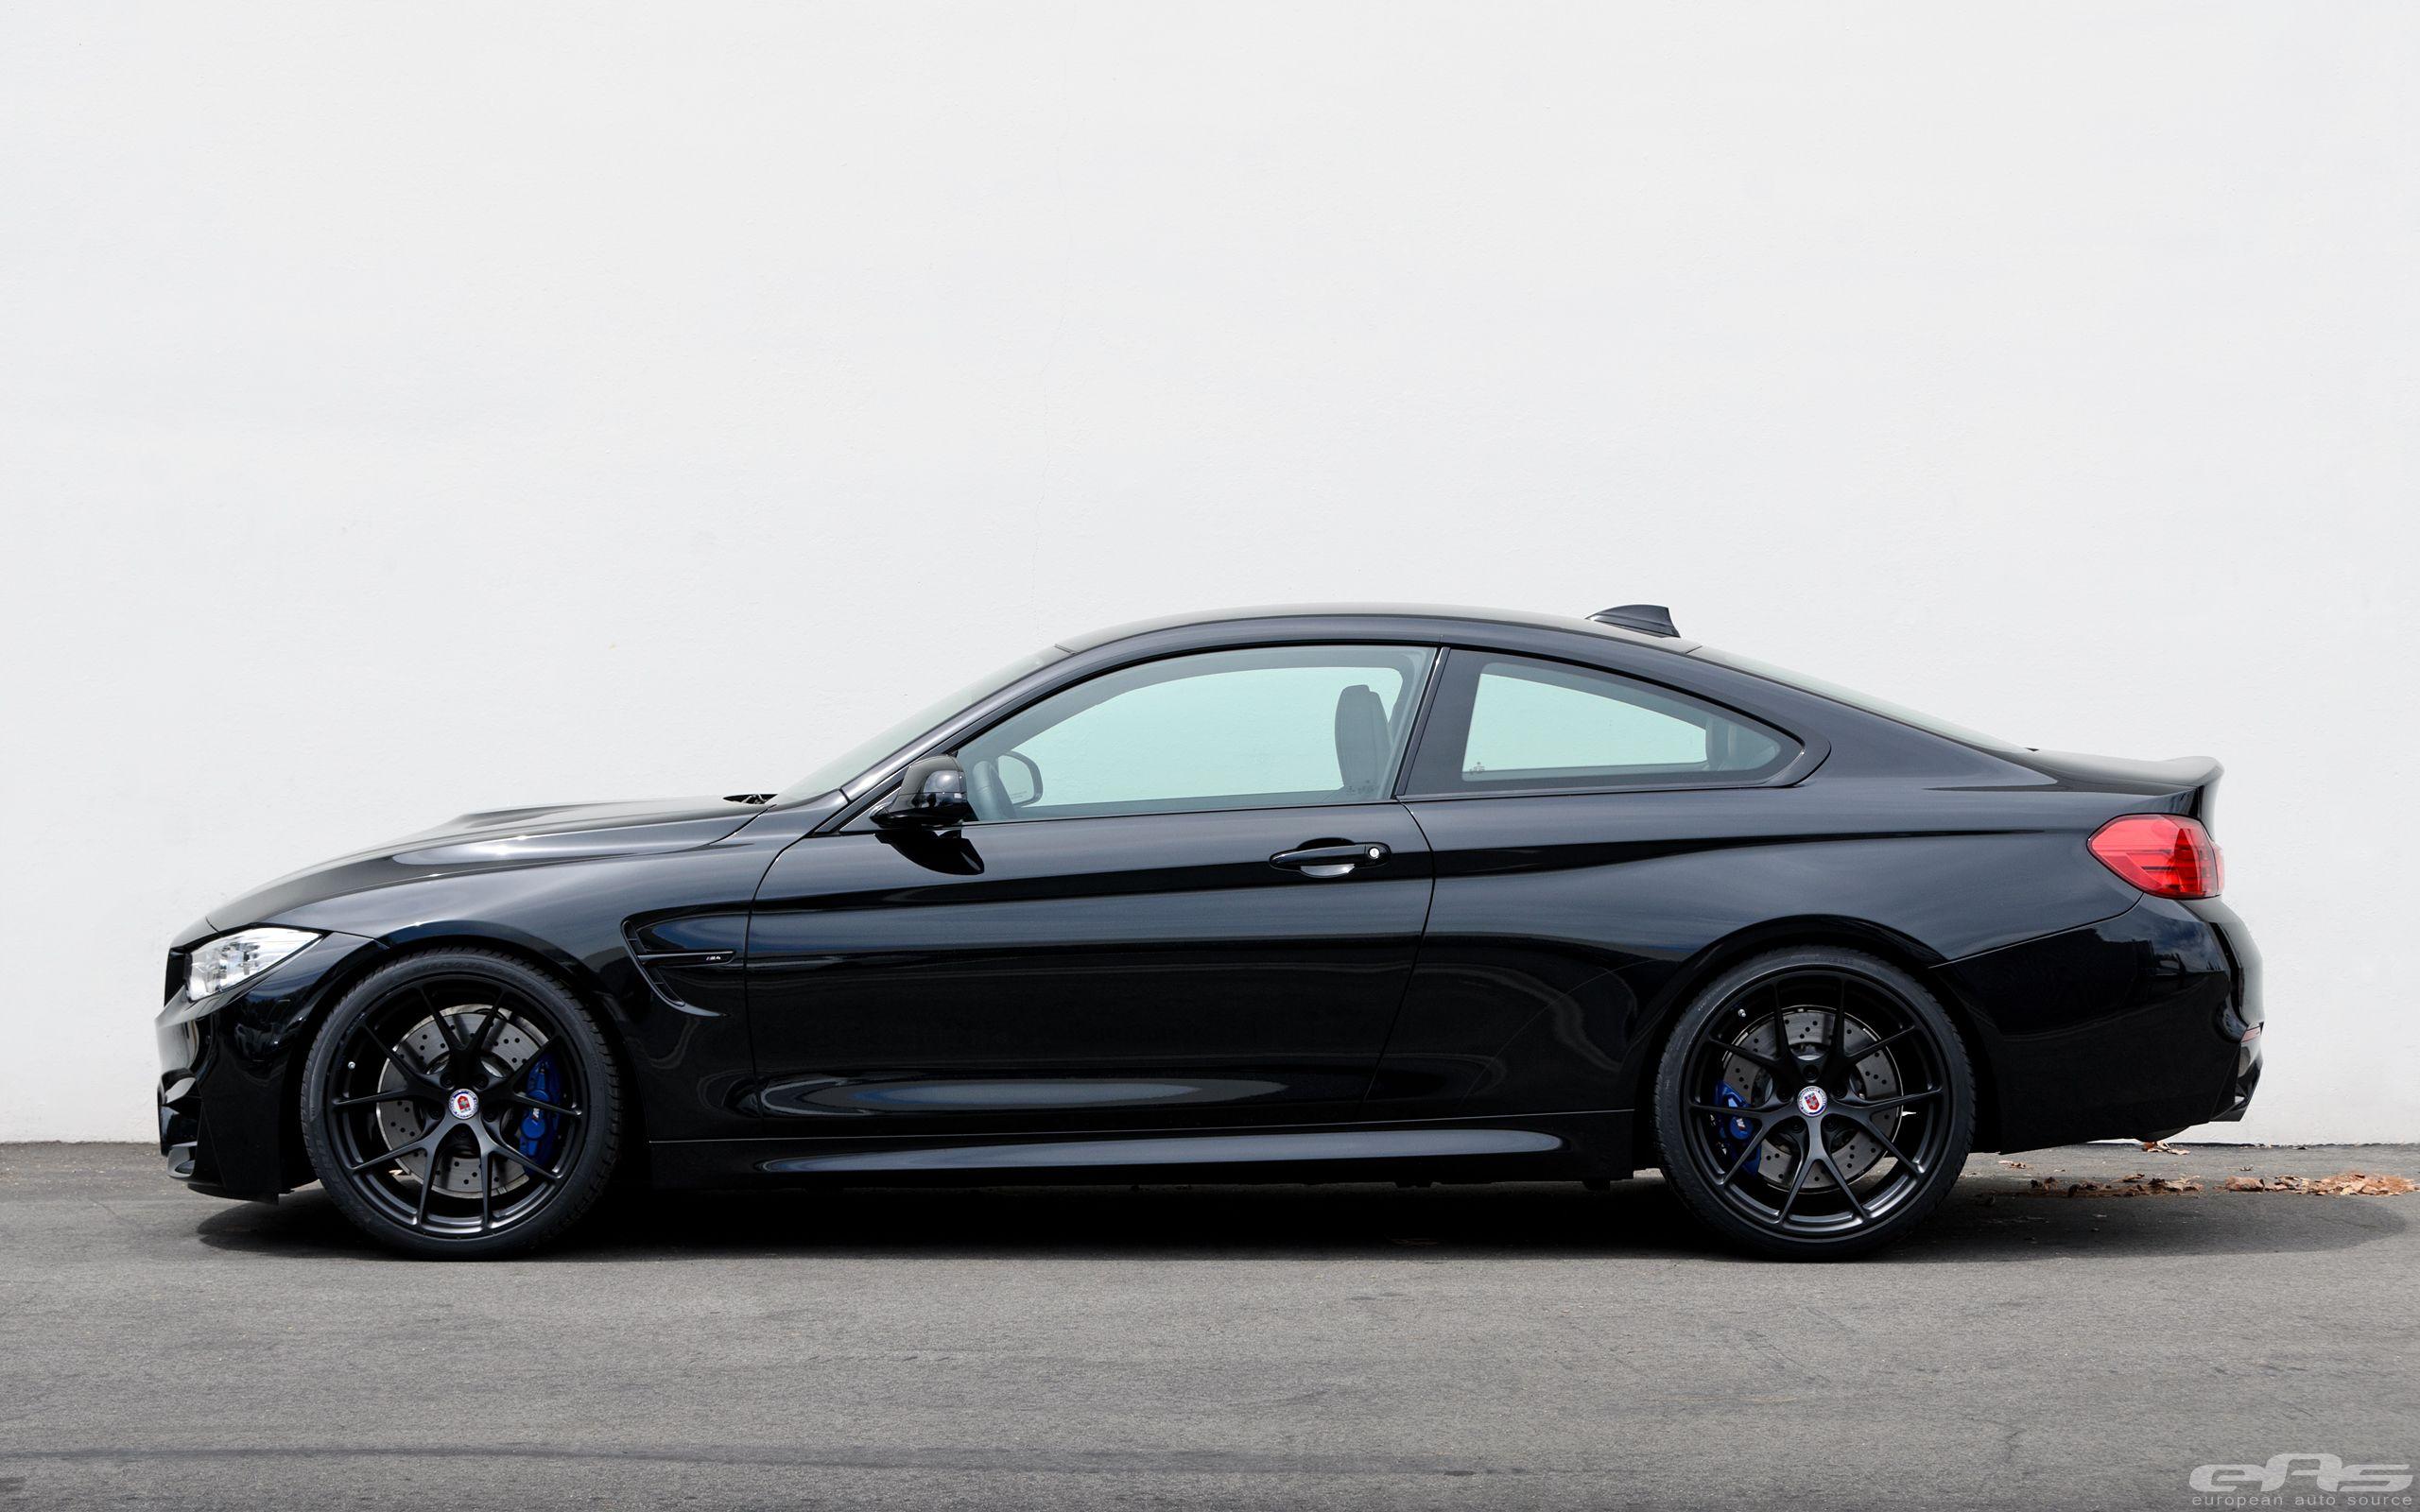 Black Sapphire Bmw M4 With Matte Black Hre Wheels Bmw M4 Bmw M4 Coupe Bmw